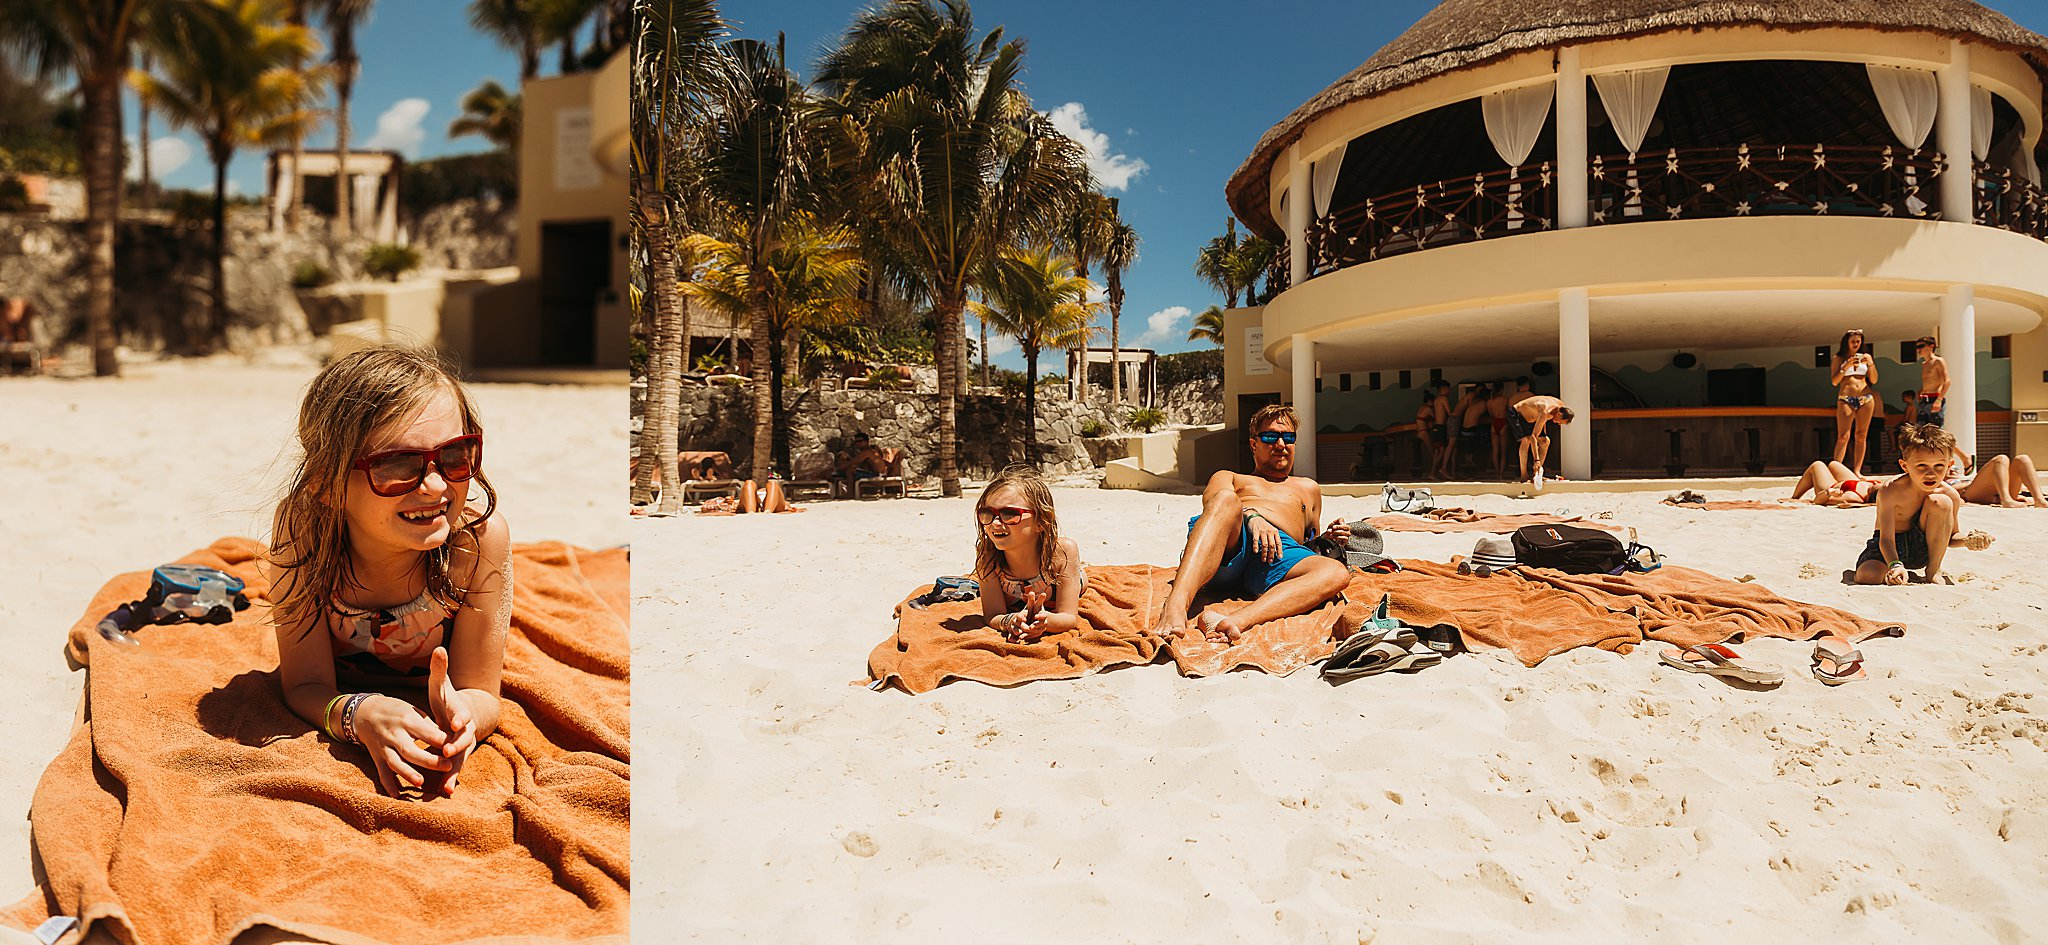 Mexico Vacation 2019 Anna Hurley Photography 13.jpg